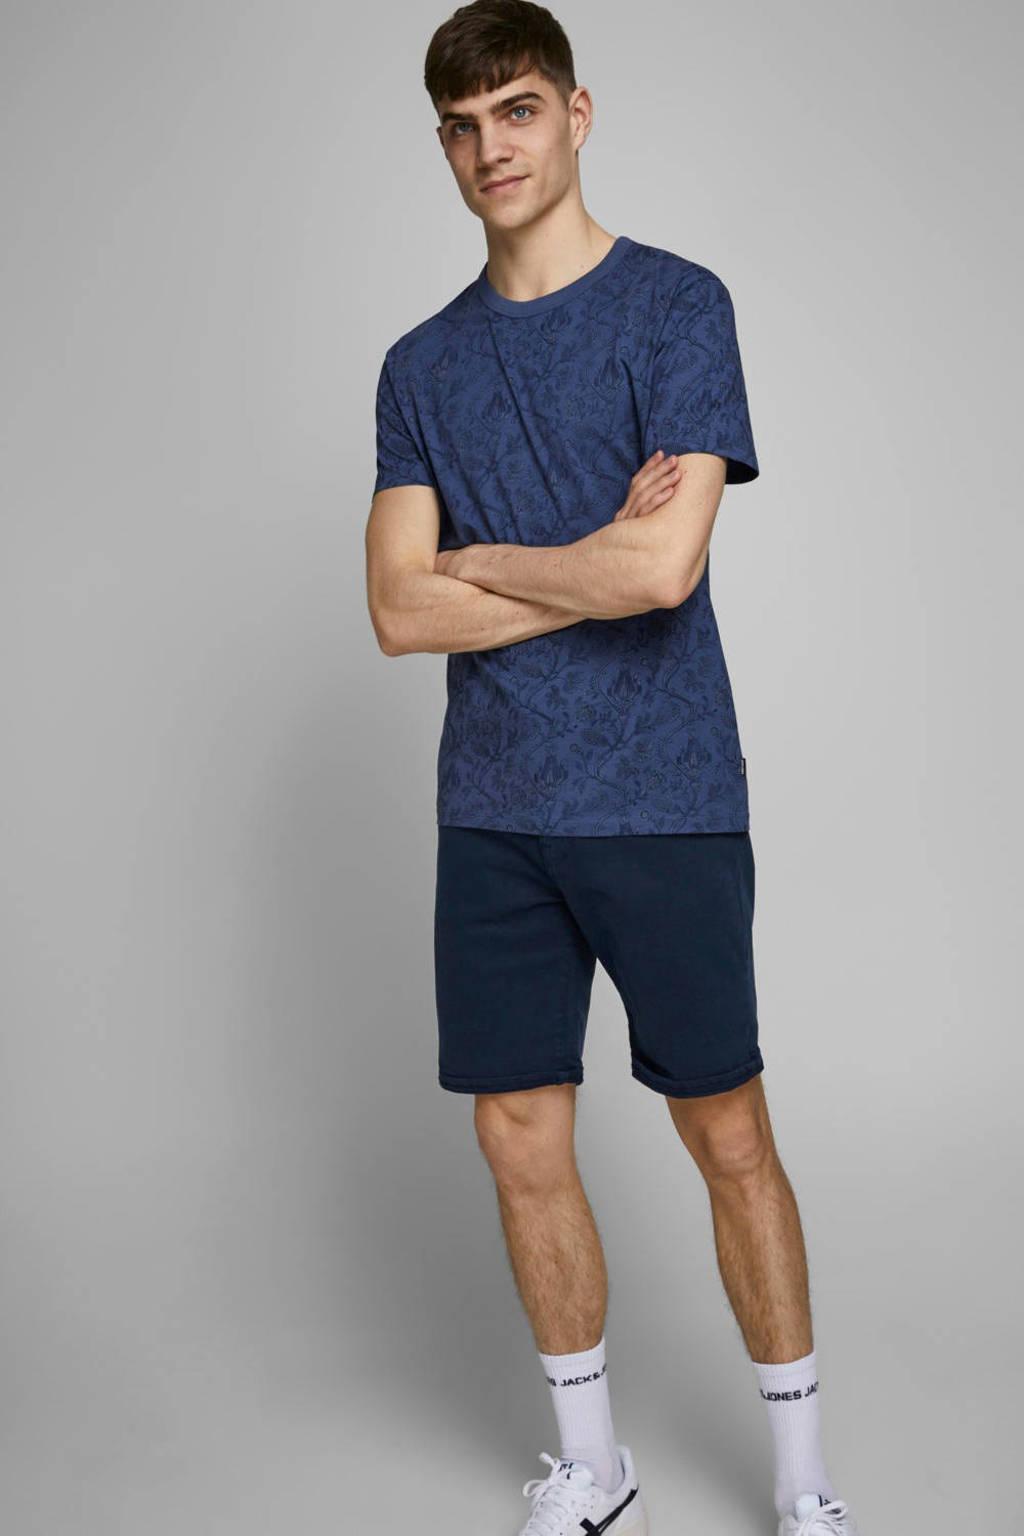 JACK & JONES JEANS INTELLIGENCE slim fit jeans short Navy Blazer